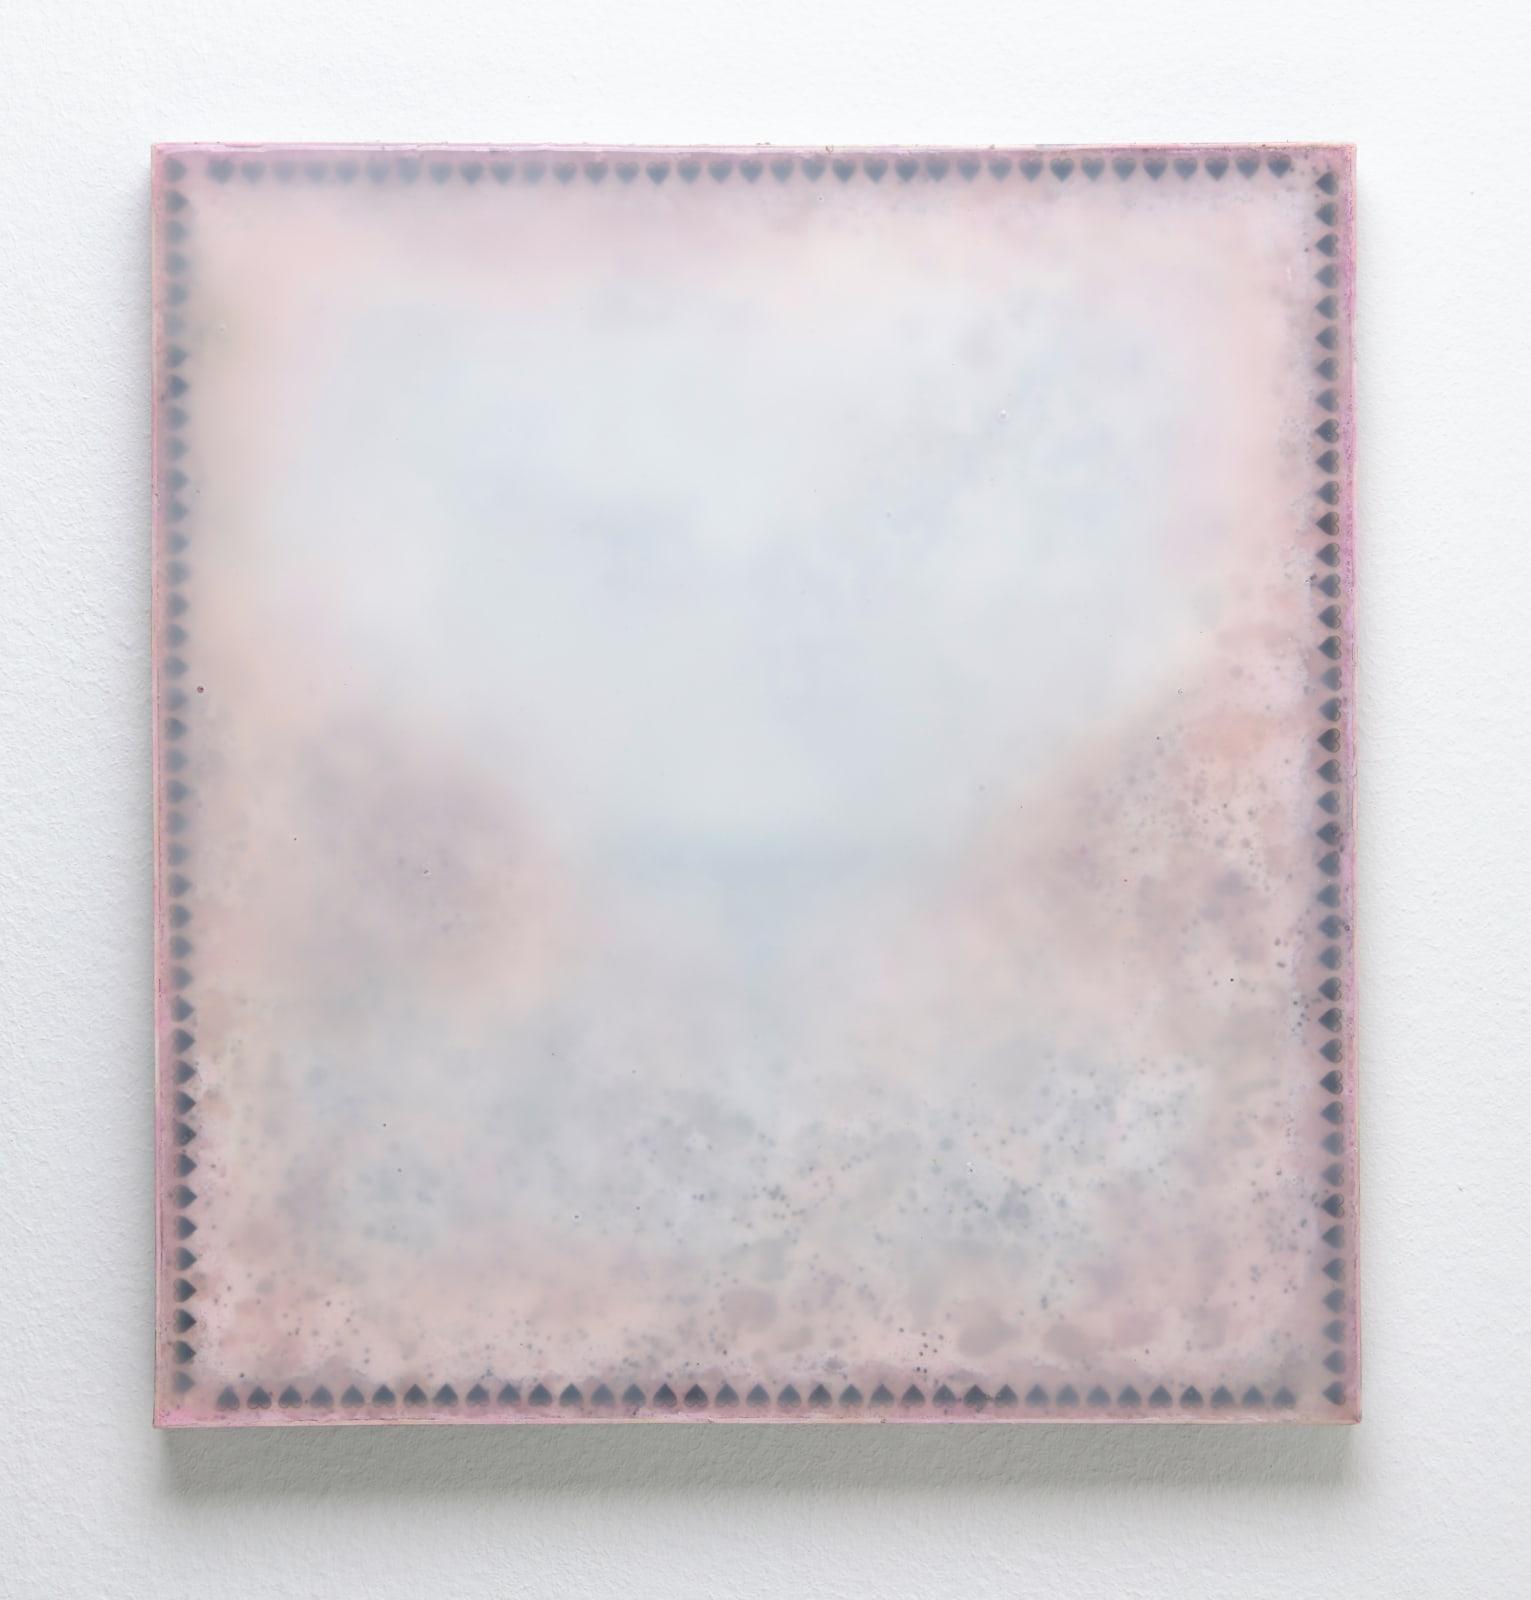 Adriano Amaral, Untitled, 2020